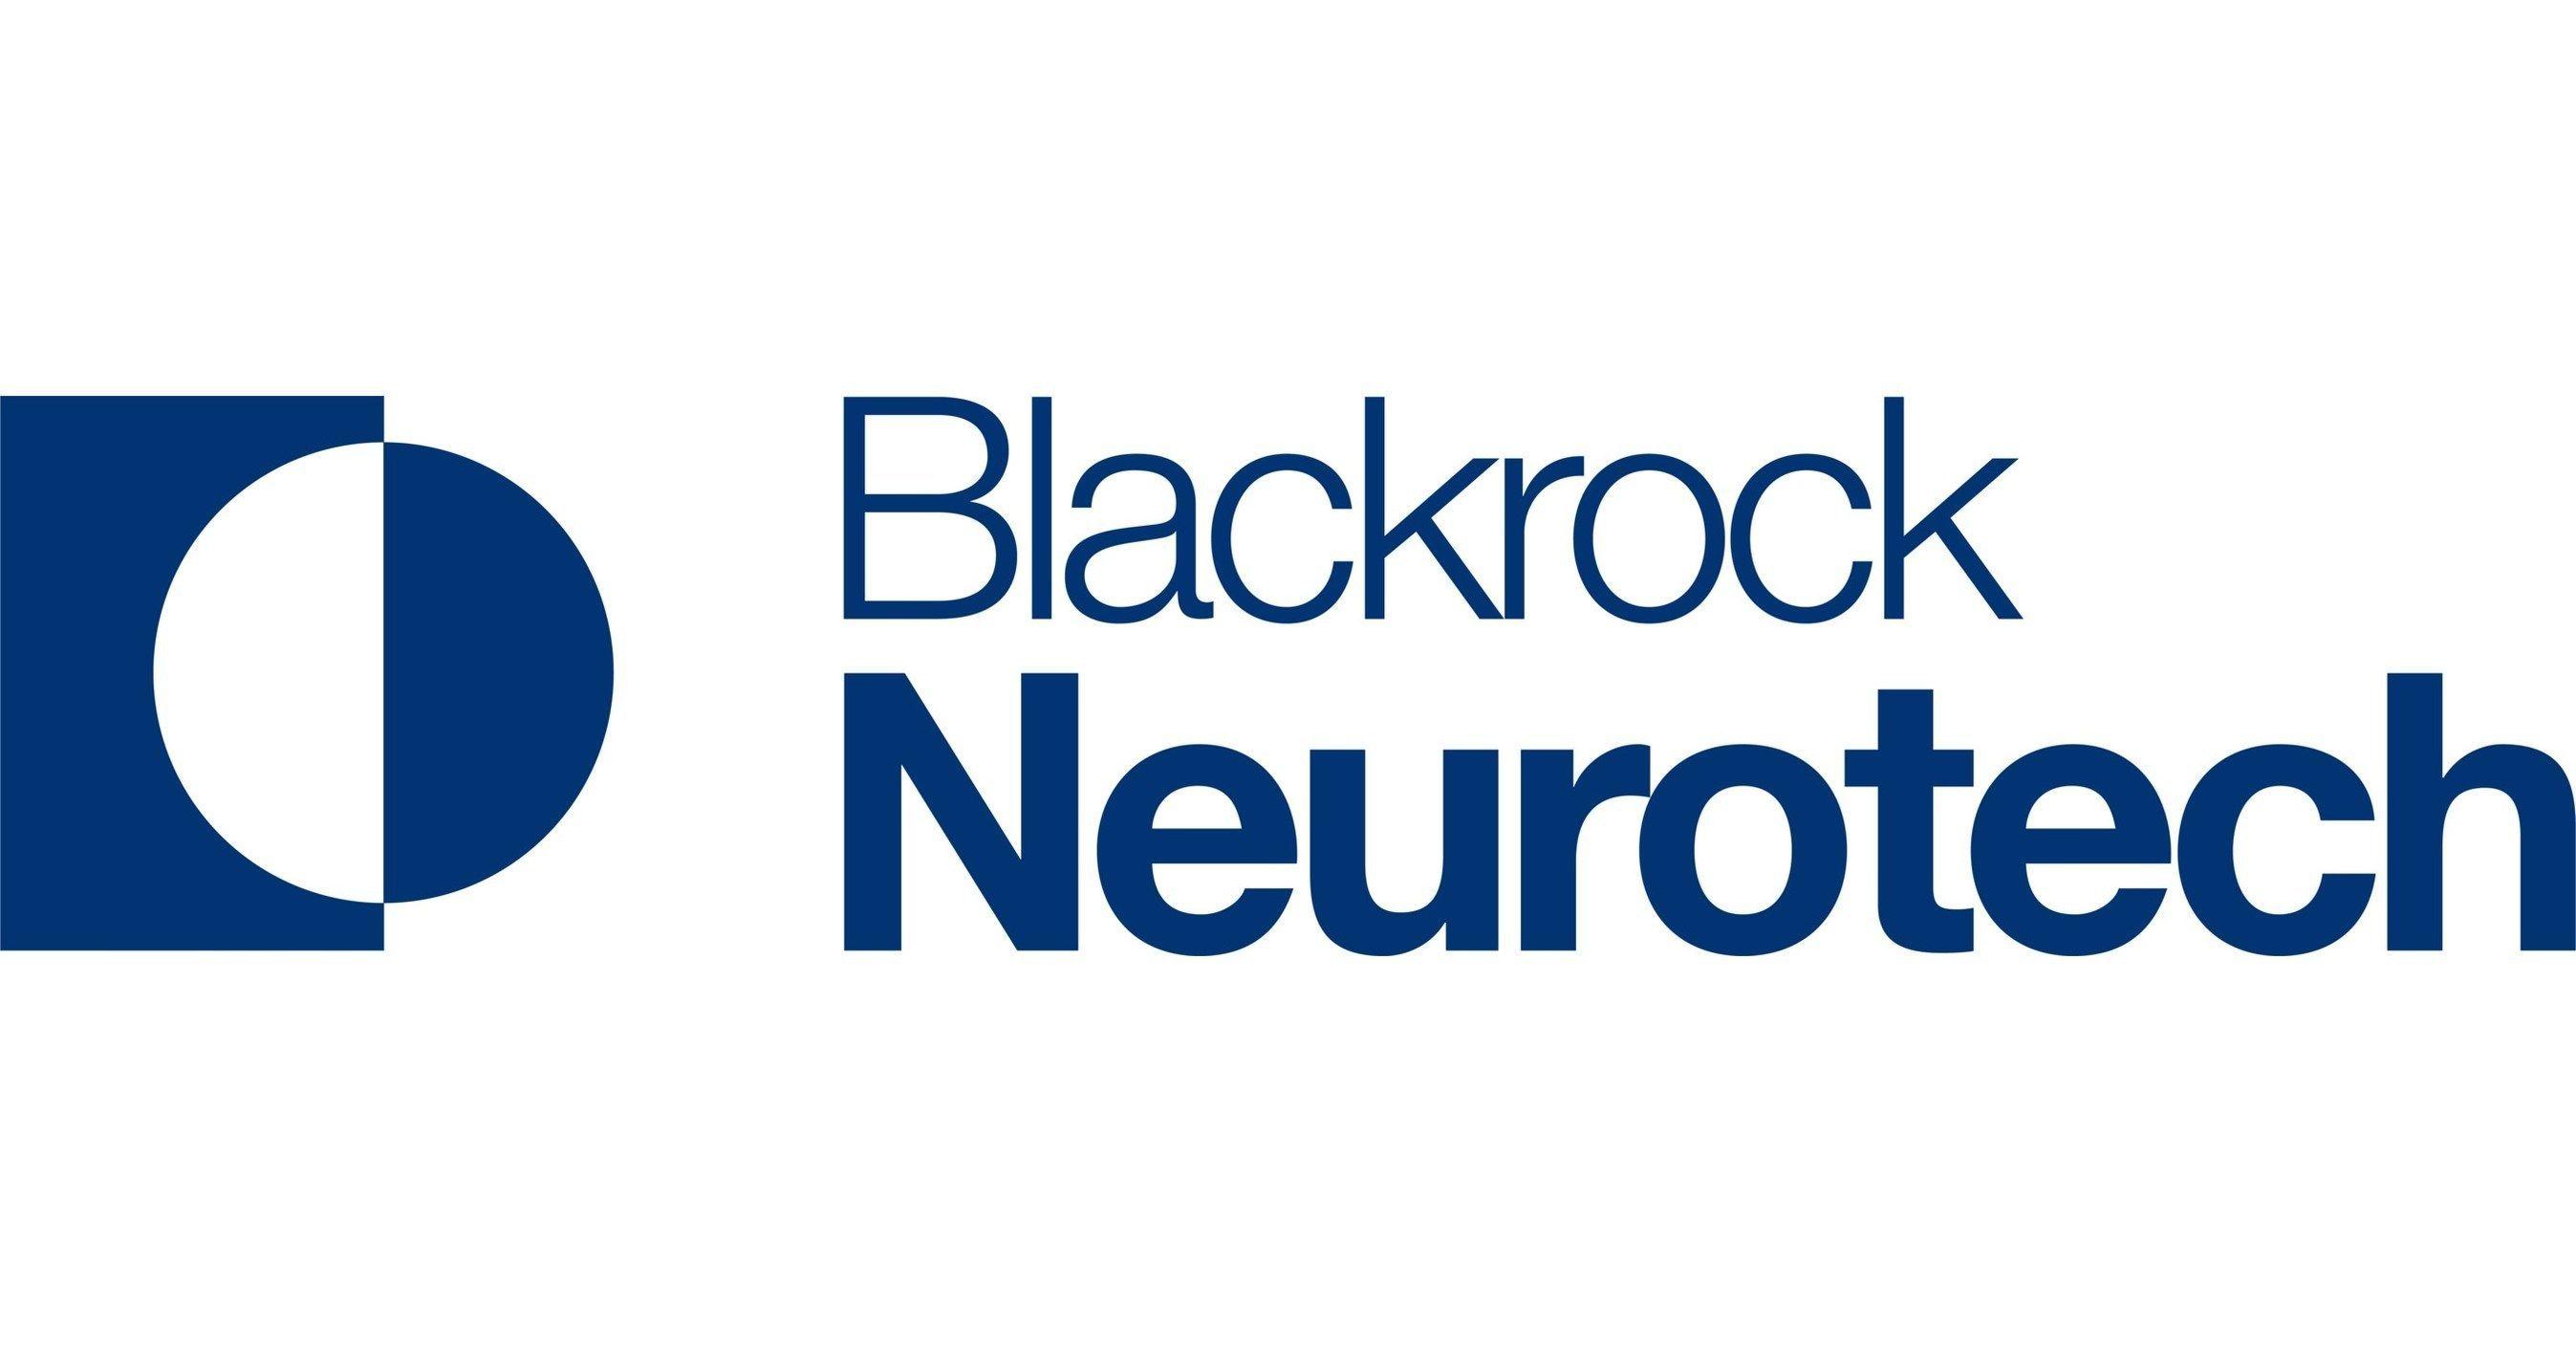 Blackrock Neurotech